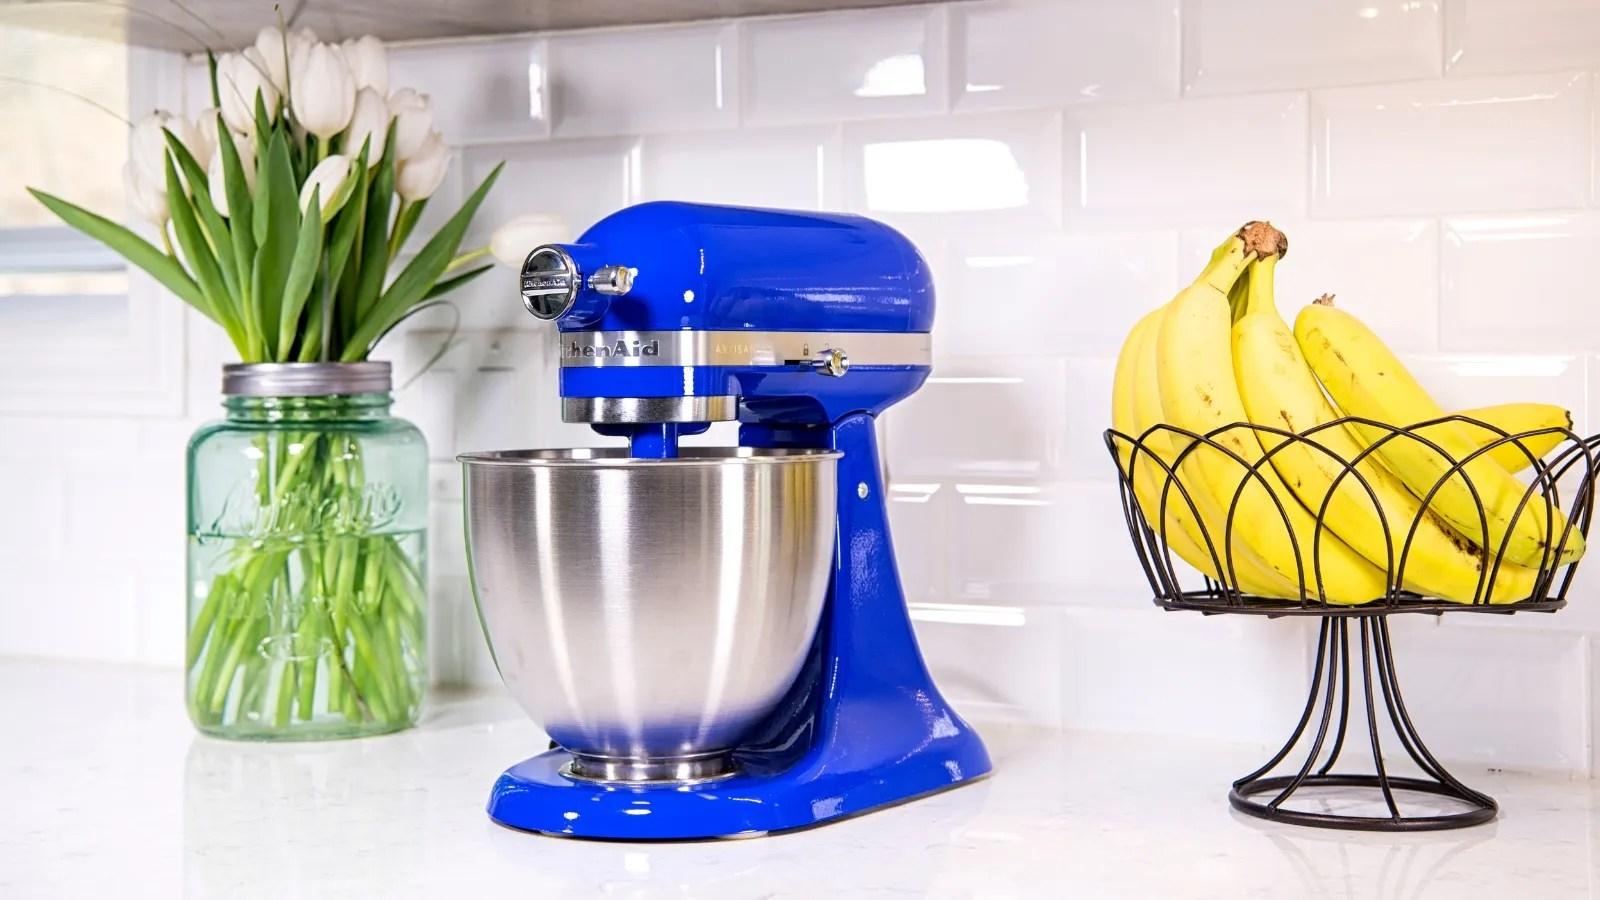 kitchen aid decor styles 今年 每个人都在痴迷20件奢侈品 international news 对于喜欢烤的人 厨房援助